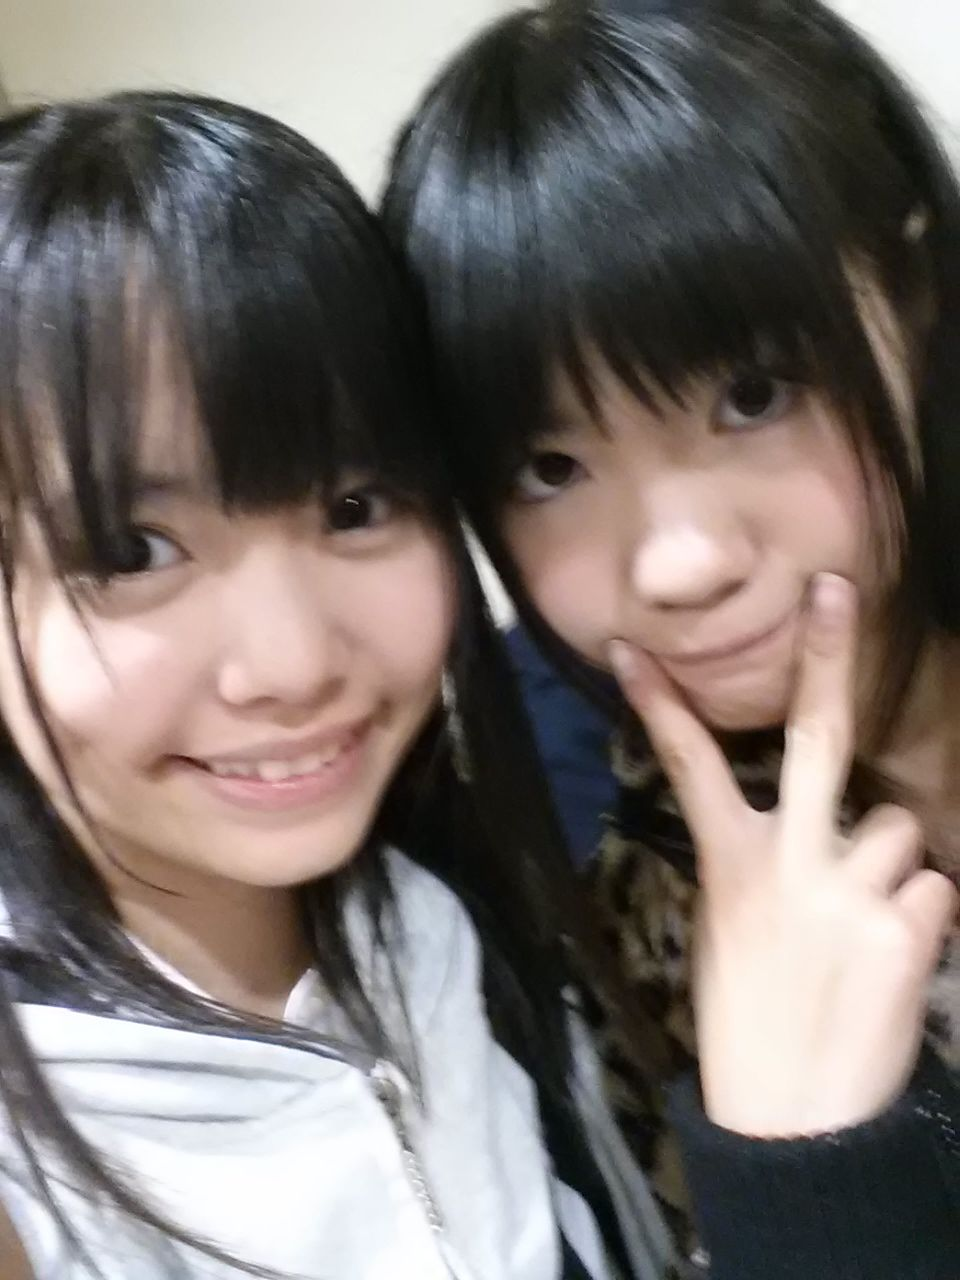 http://livedoor.blogimg.jp/otohaeika/imgs/3/3/33ec973f.jpg